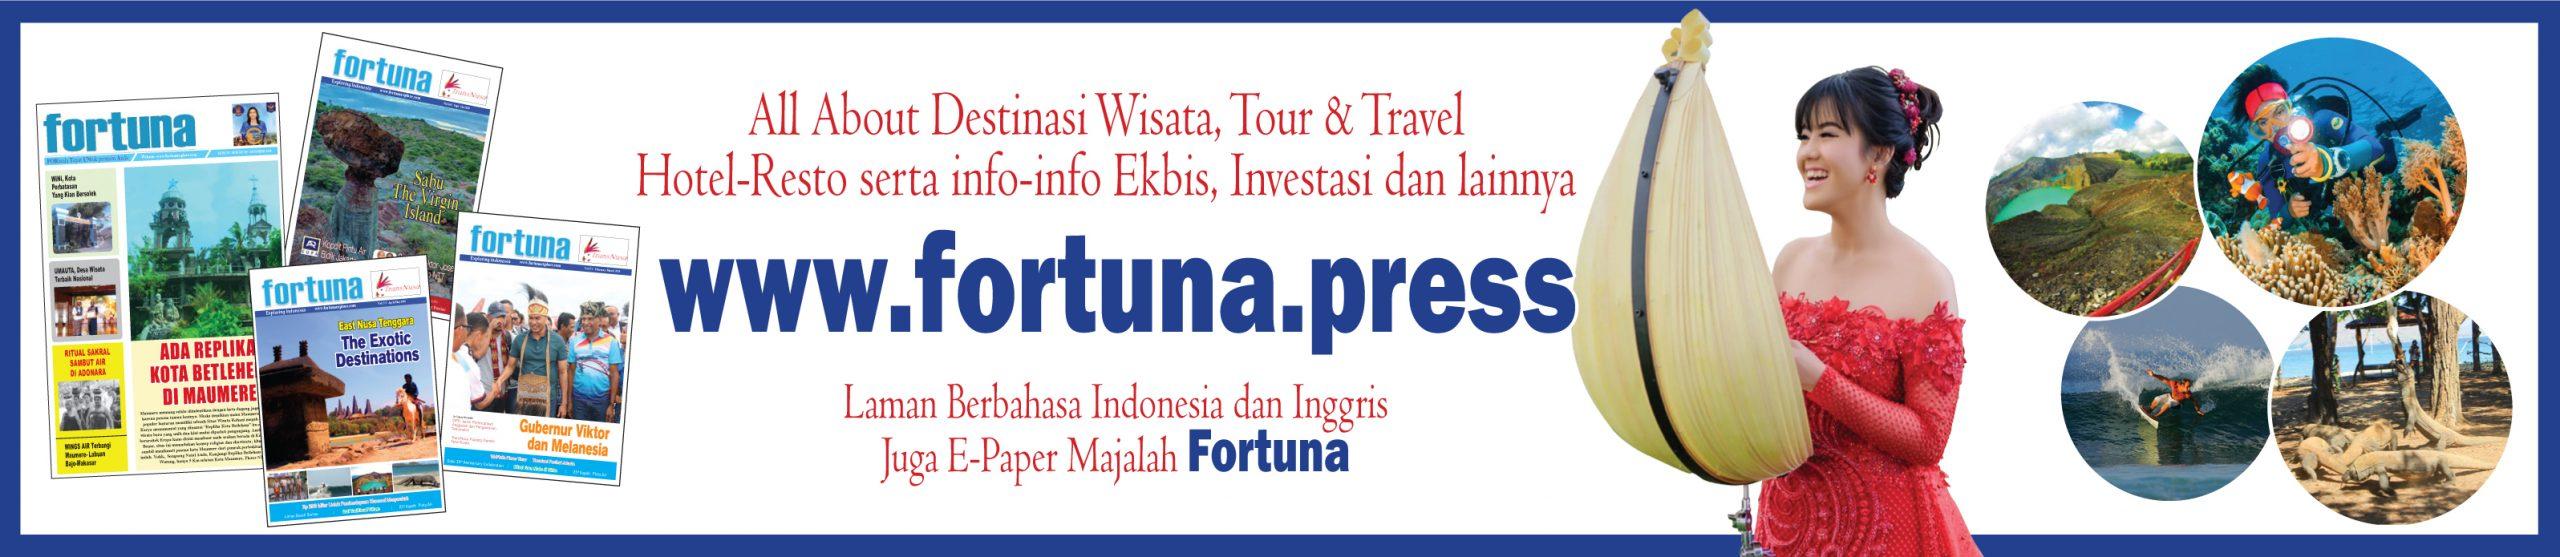 Fortuna English Version